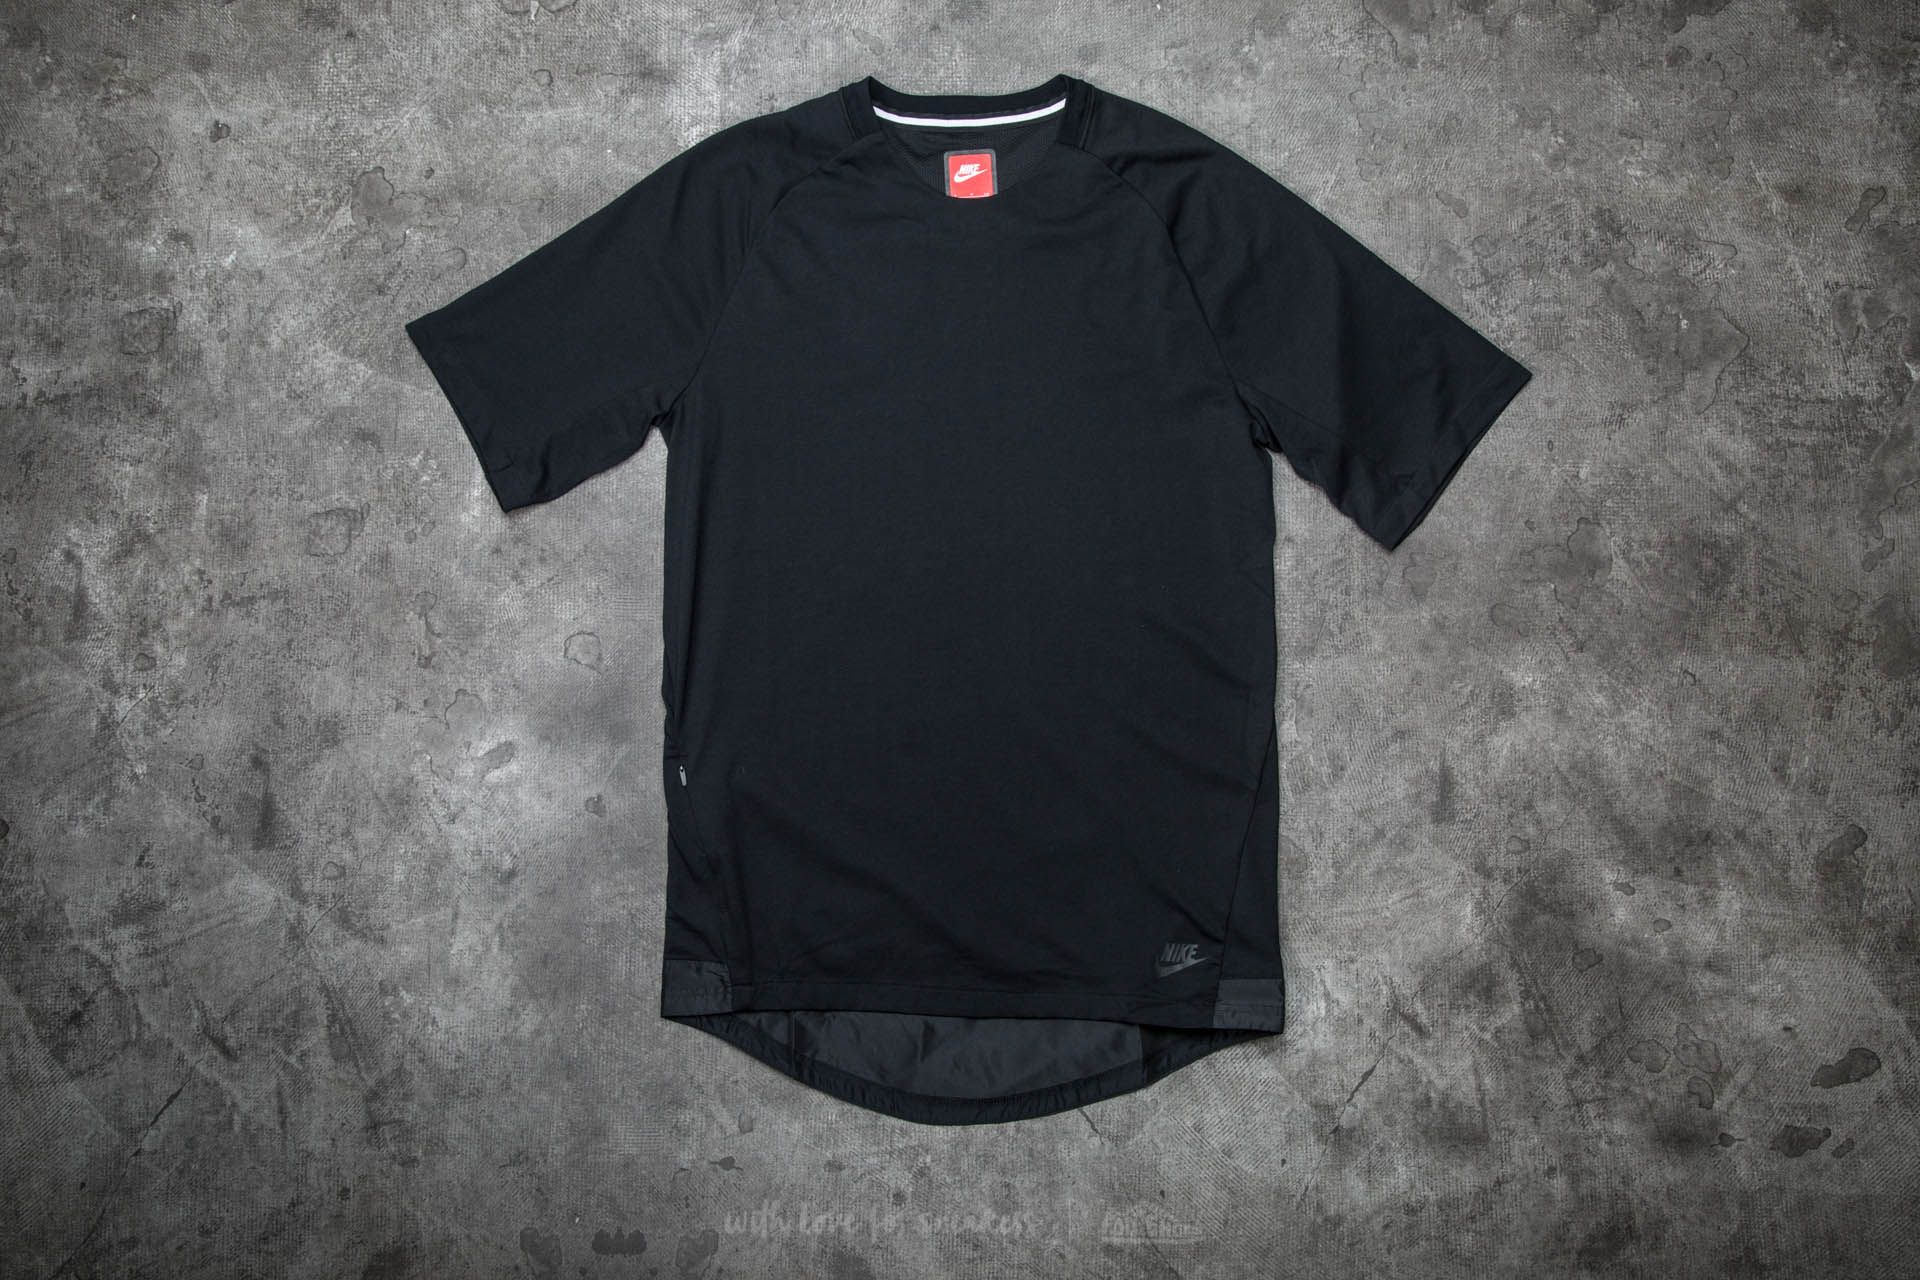 Nike Sportwear Bonded Short Sleeve Top Black